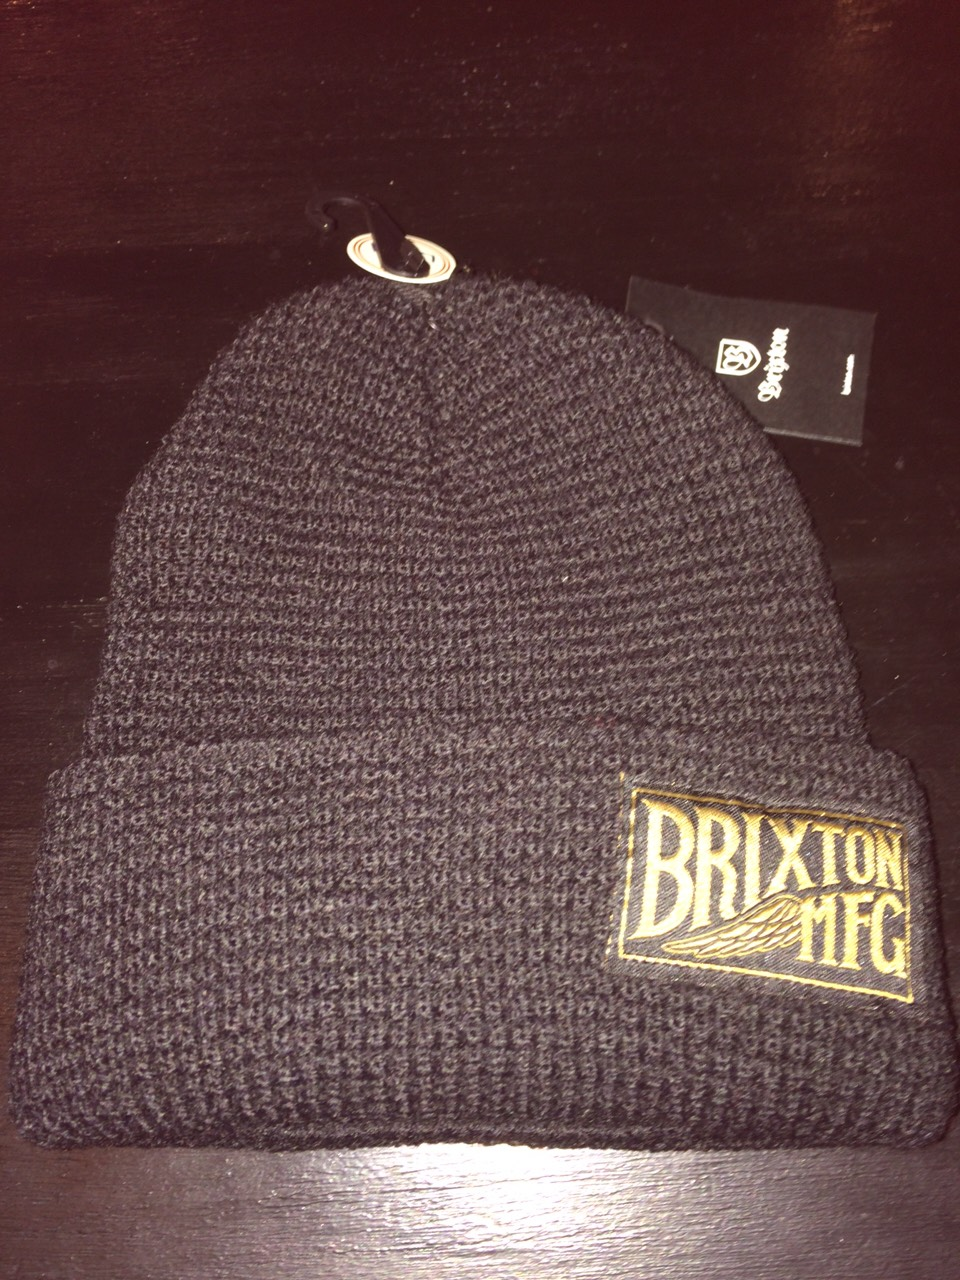 brixton_nit01